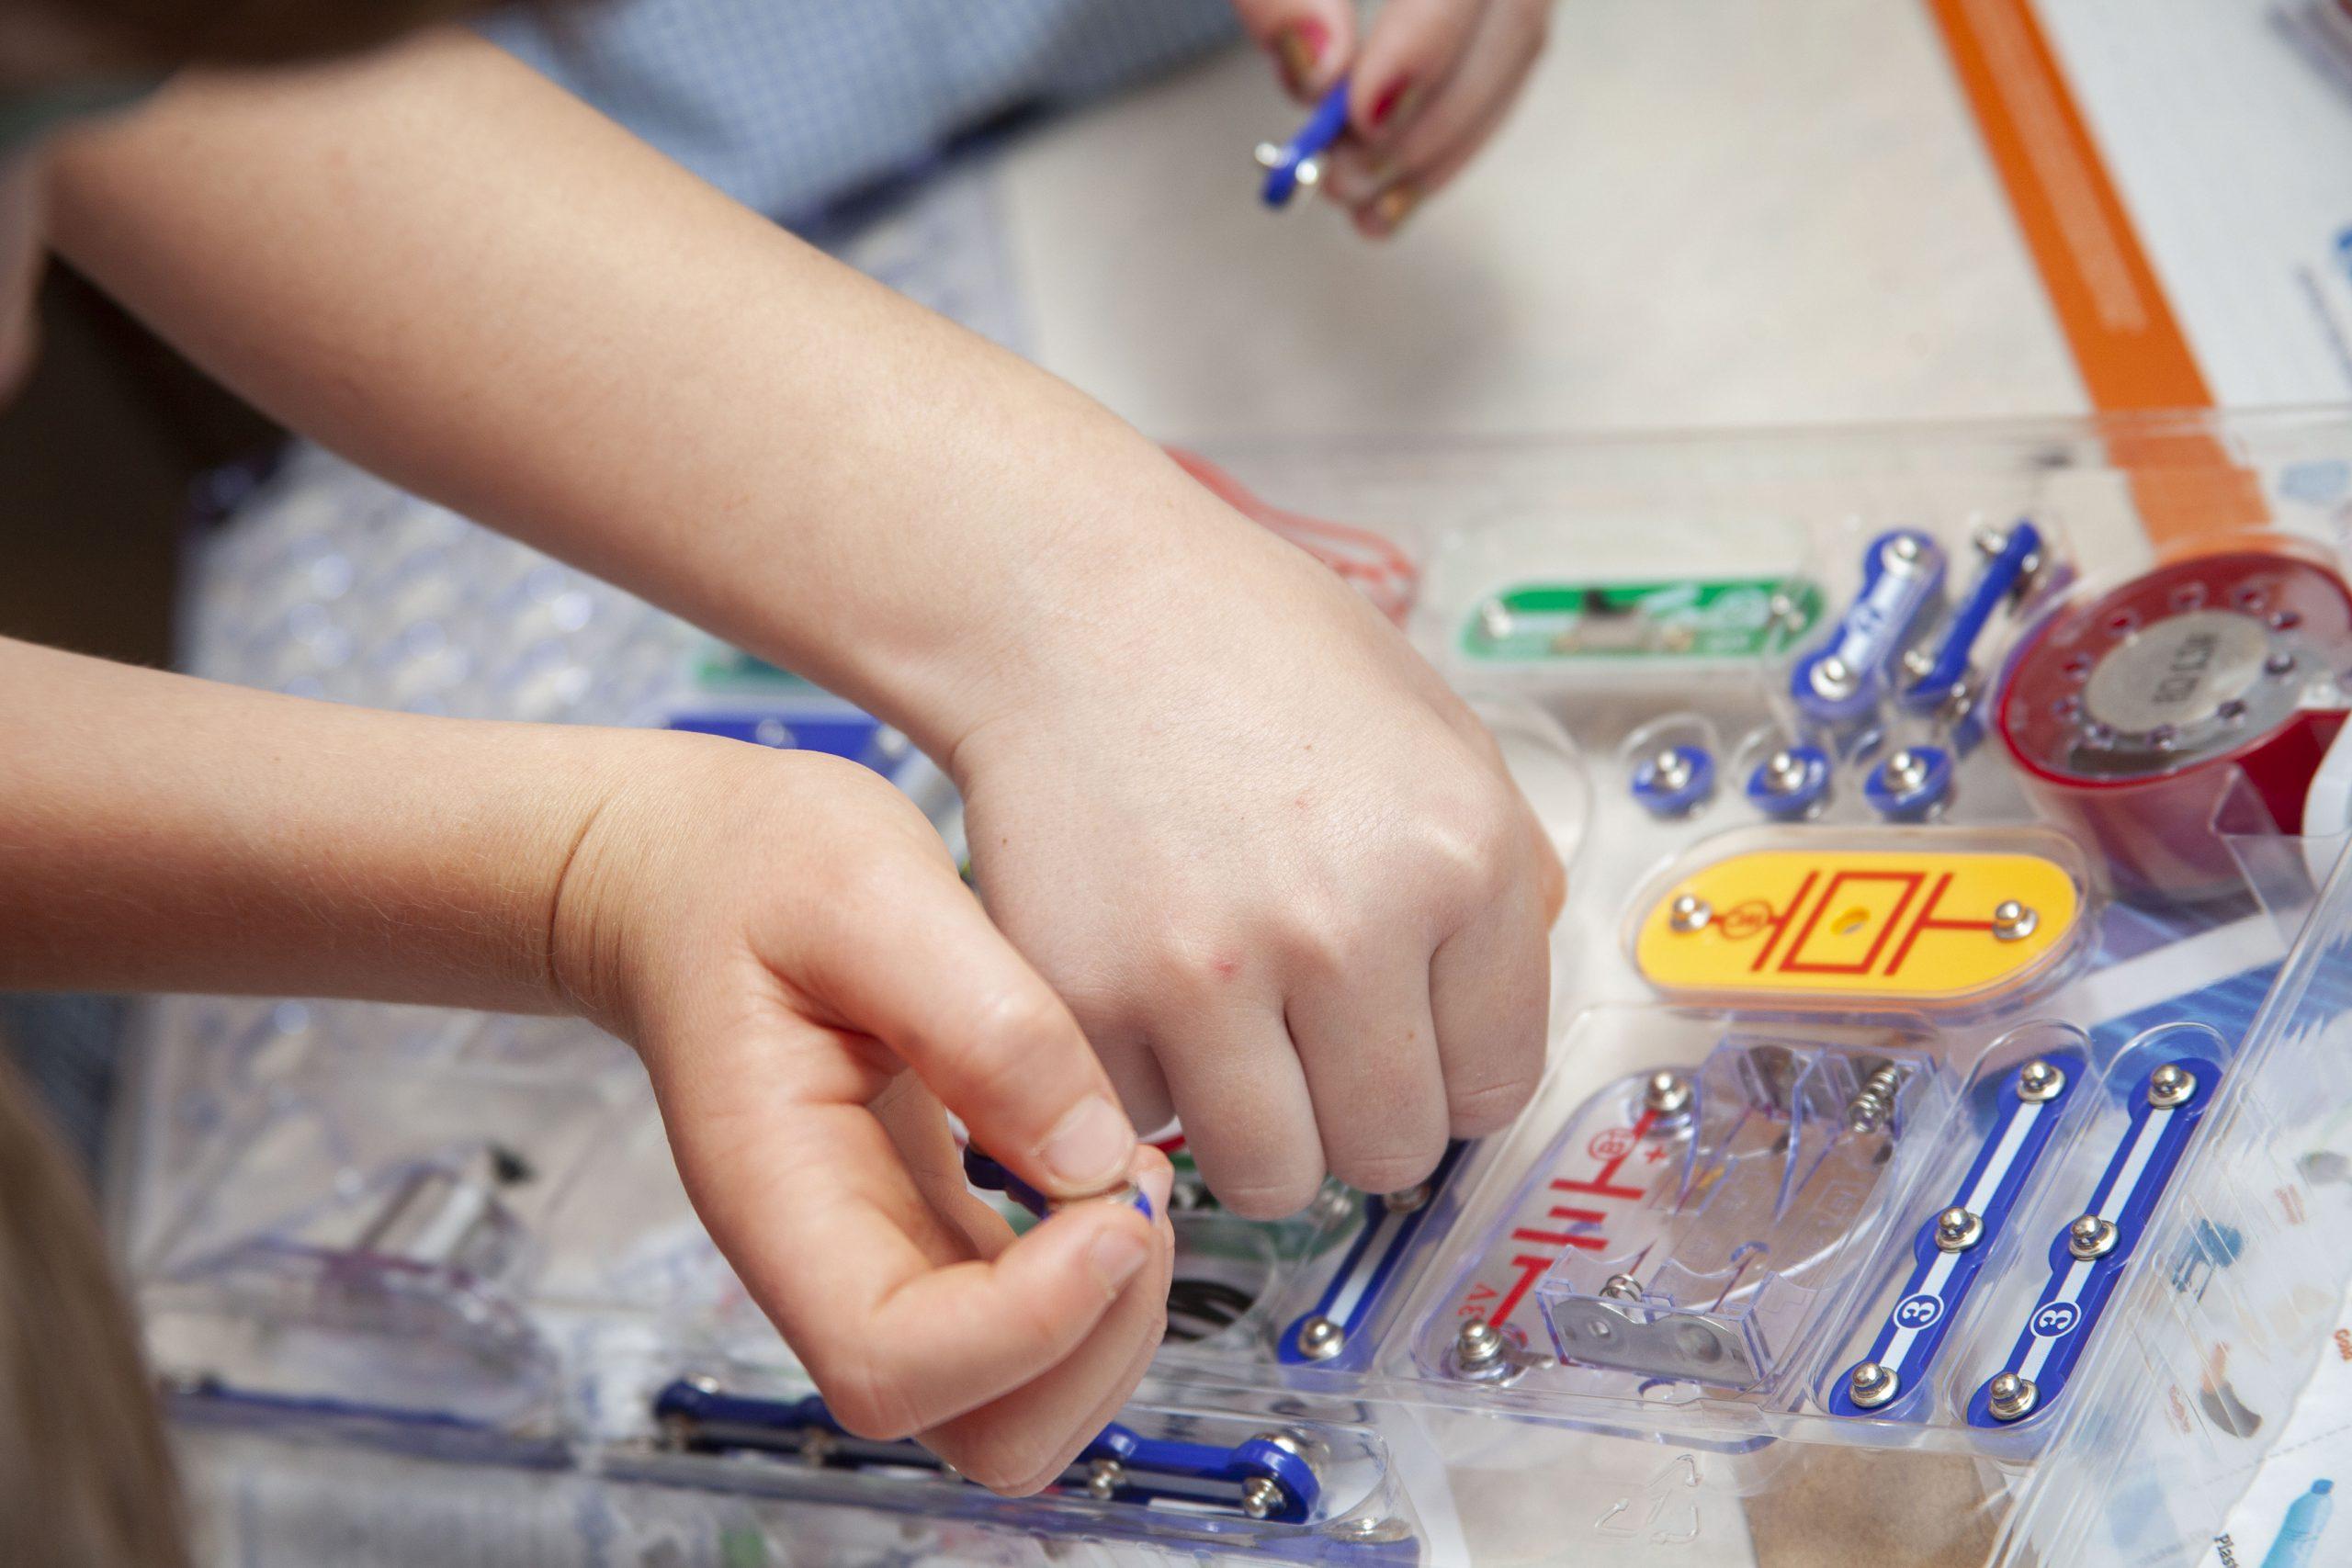 Children's hands above a circuit board